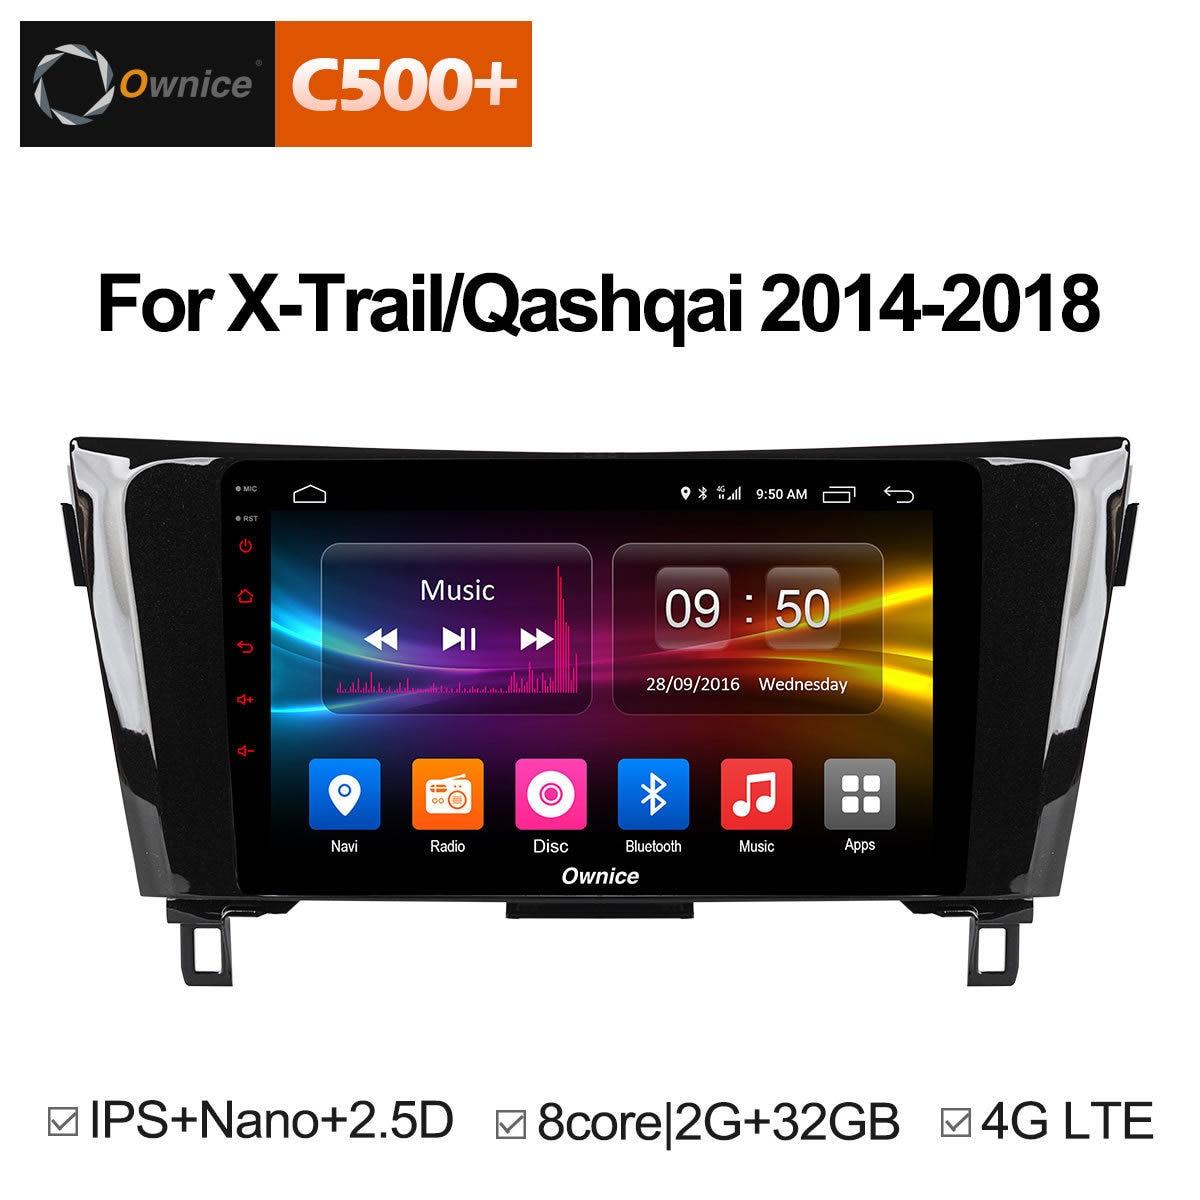 Ownice Android 8.1 Multimídia Carro DVD Player 8 núcleo B Para Nissan Qashqai X Trail-2014-2018 4G Unidade Central GPS Estéreo DAB PC